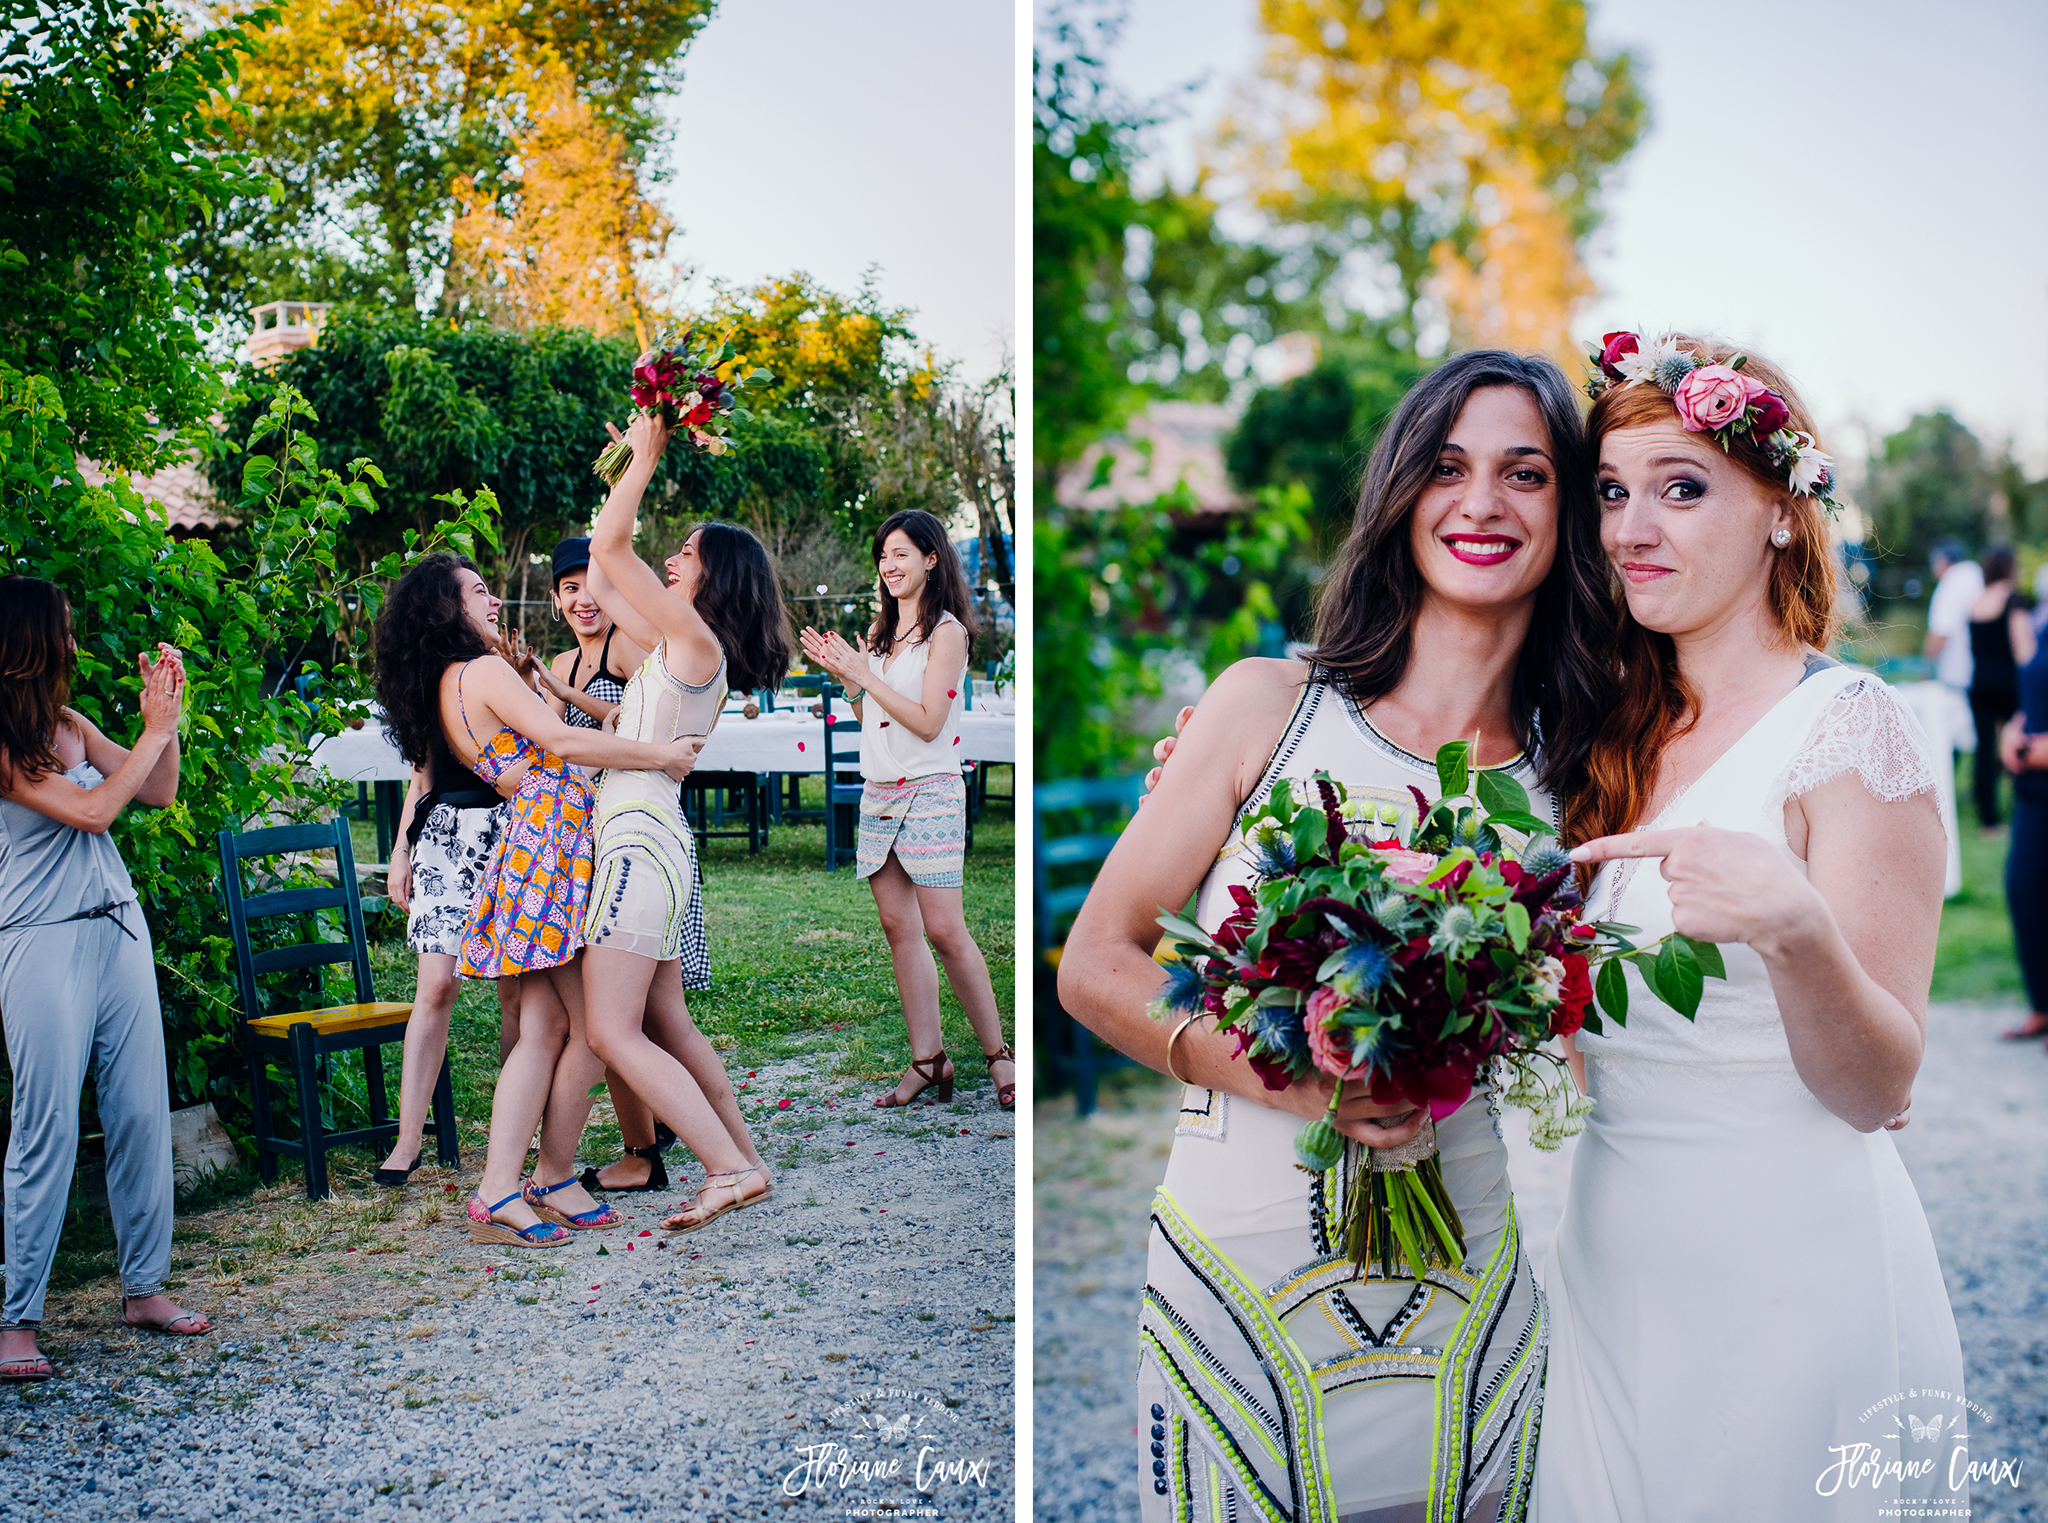 photographe-mariage-toulouse-rocknroll-maries-tatoues-floriane-caux-93